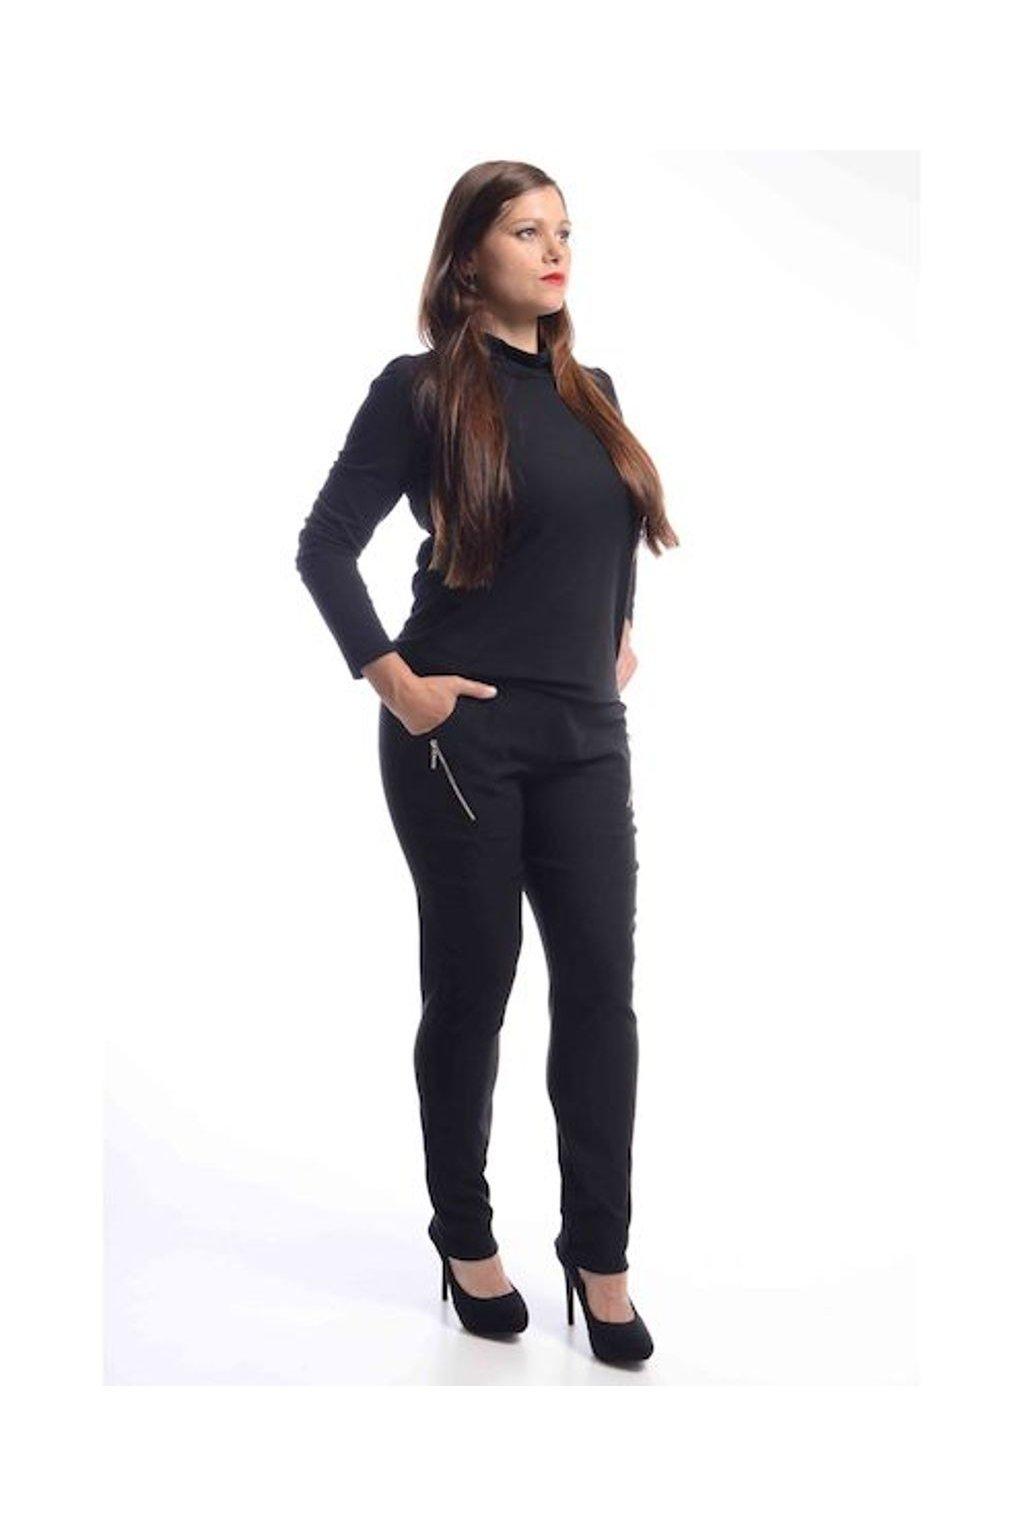 62T Kalhoty Zita (Velikost 36, Barva Černá)